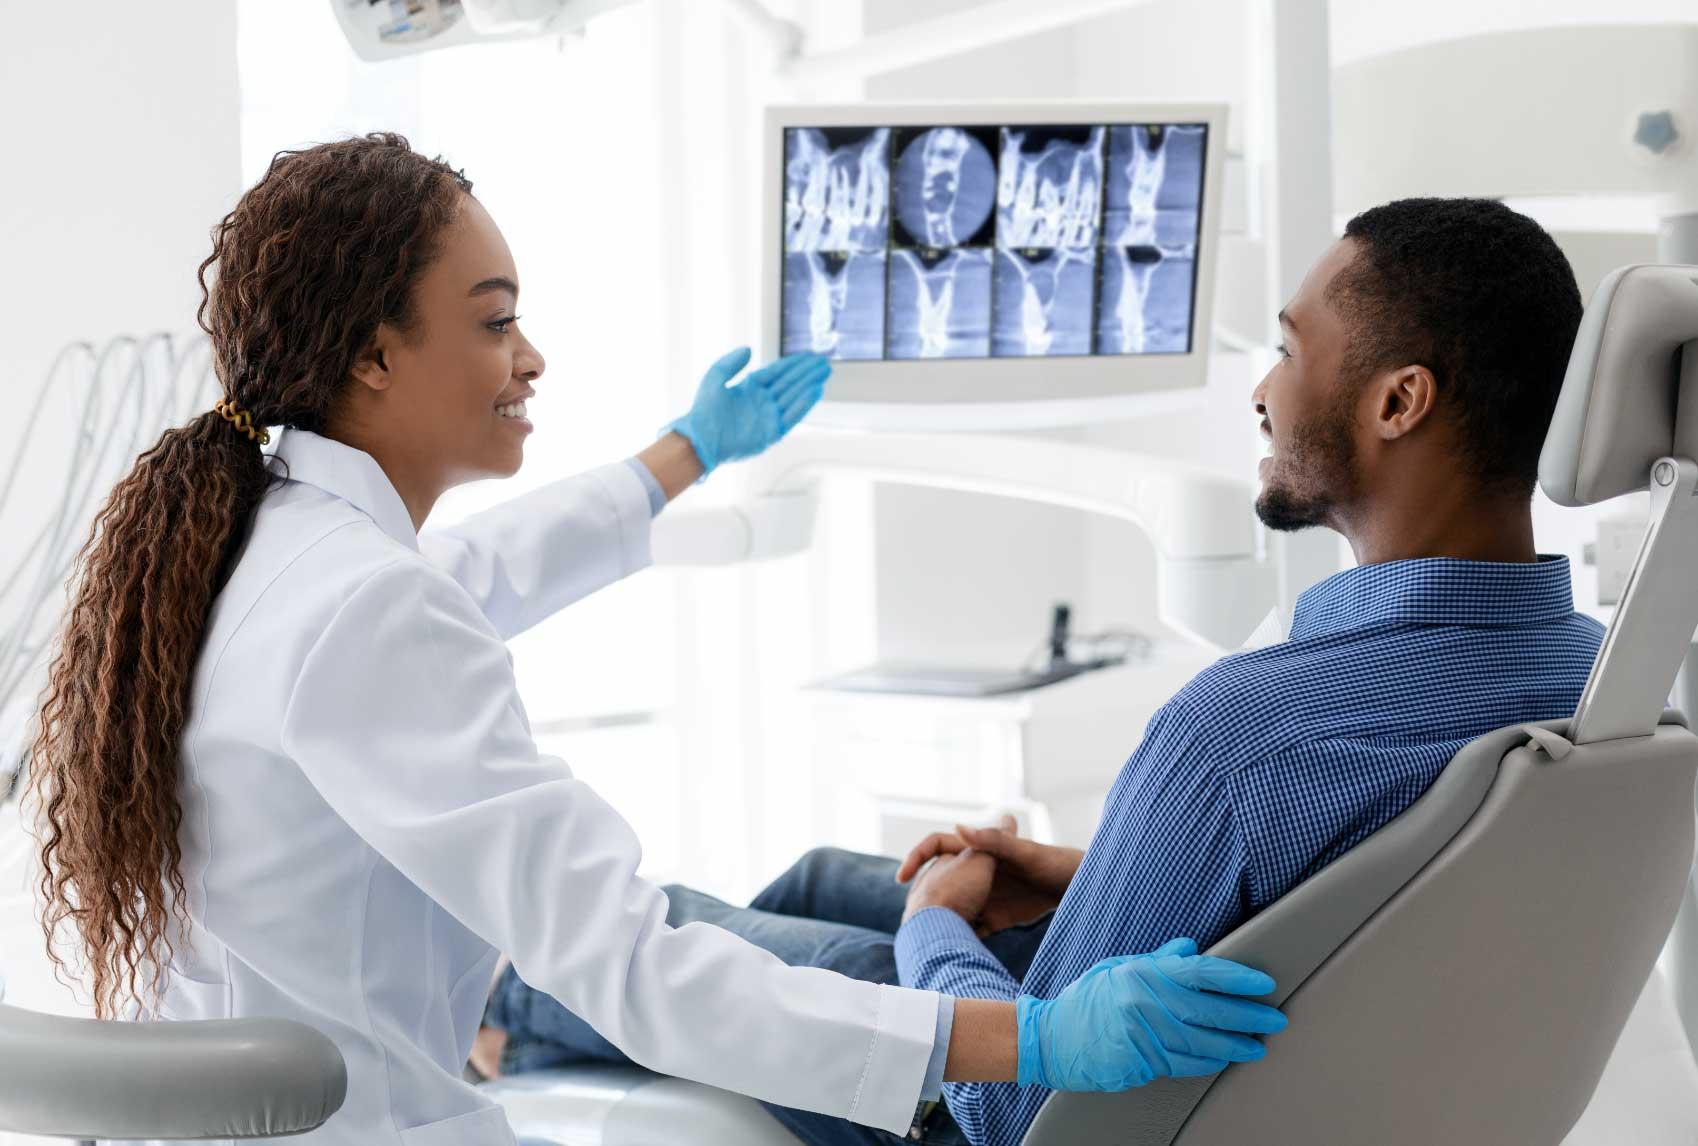 dentist-patient-xray